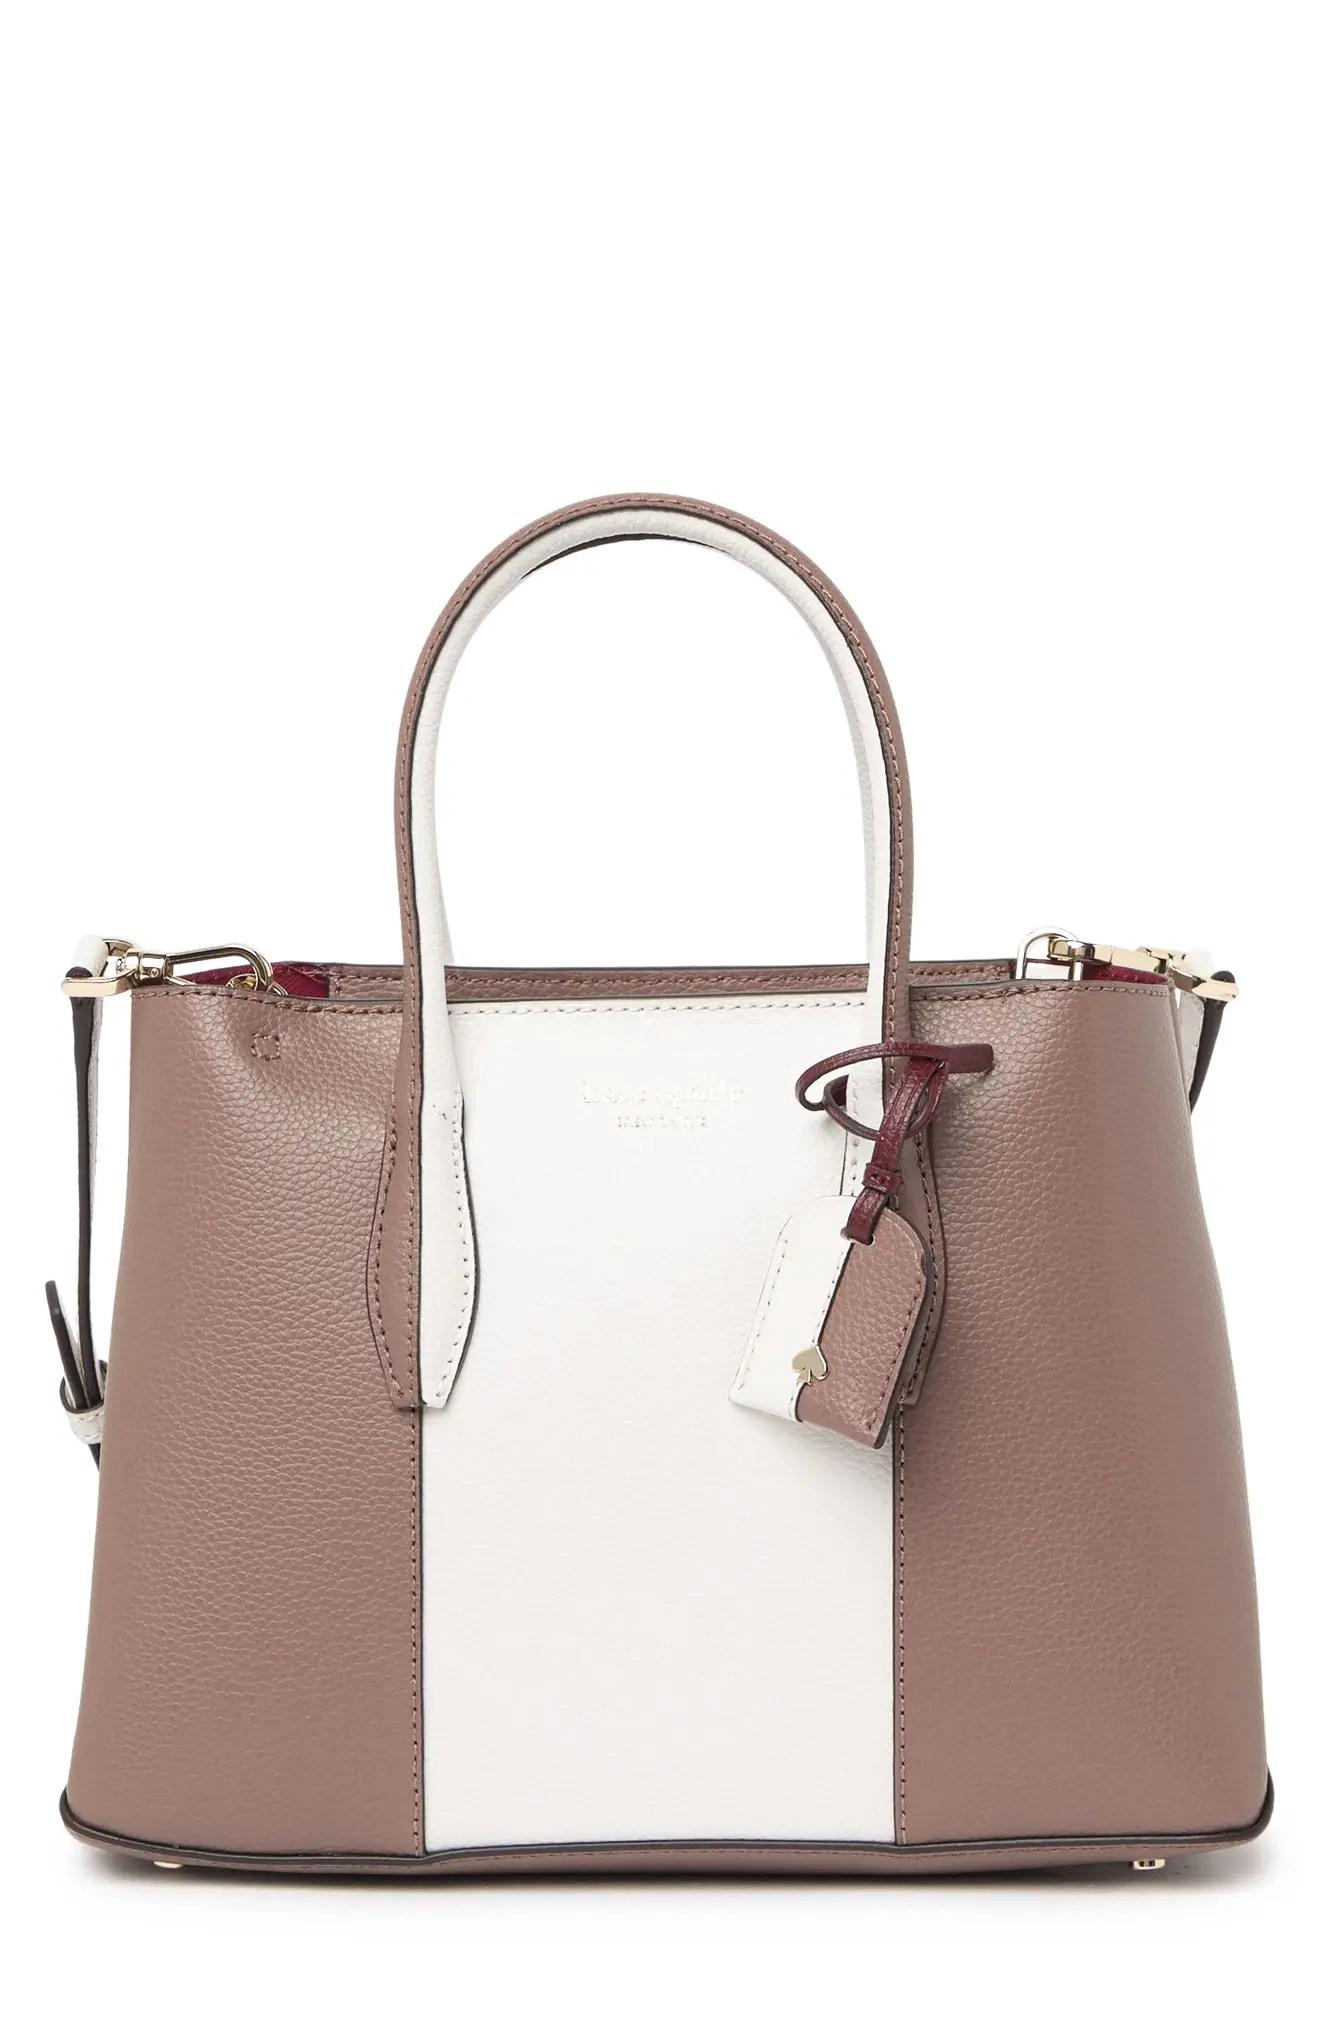 kate spade new york satchels for women